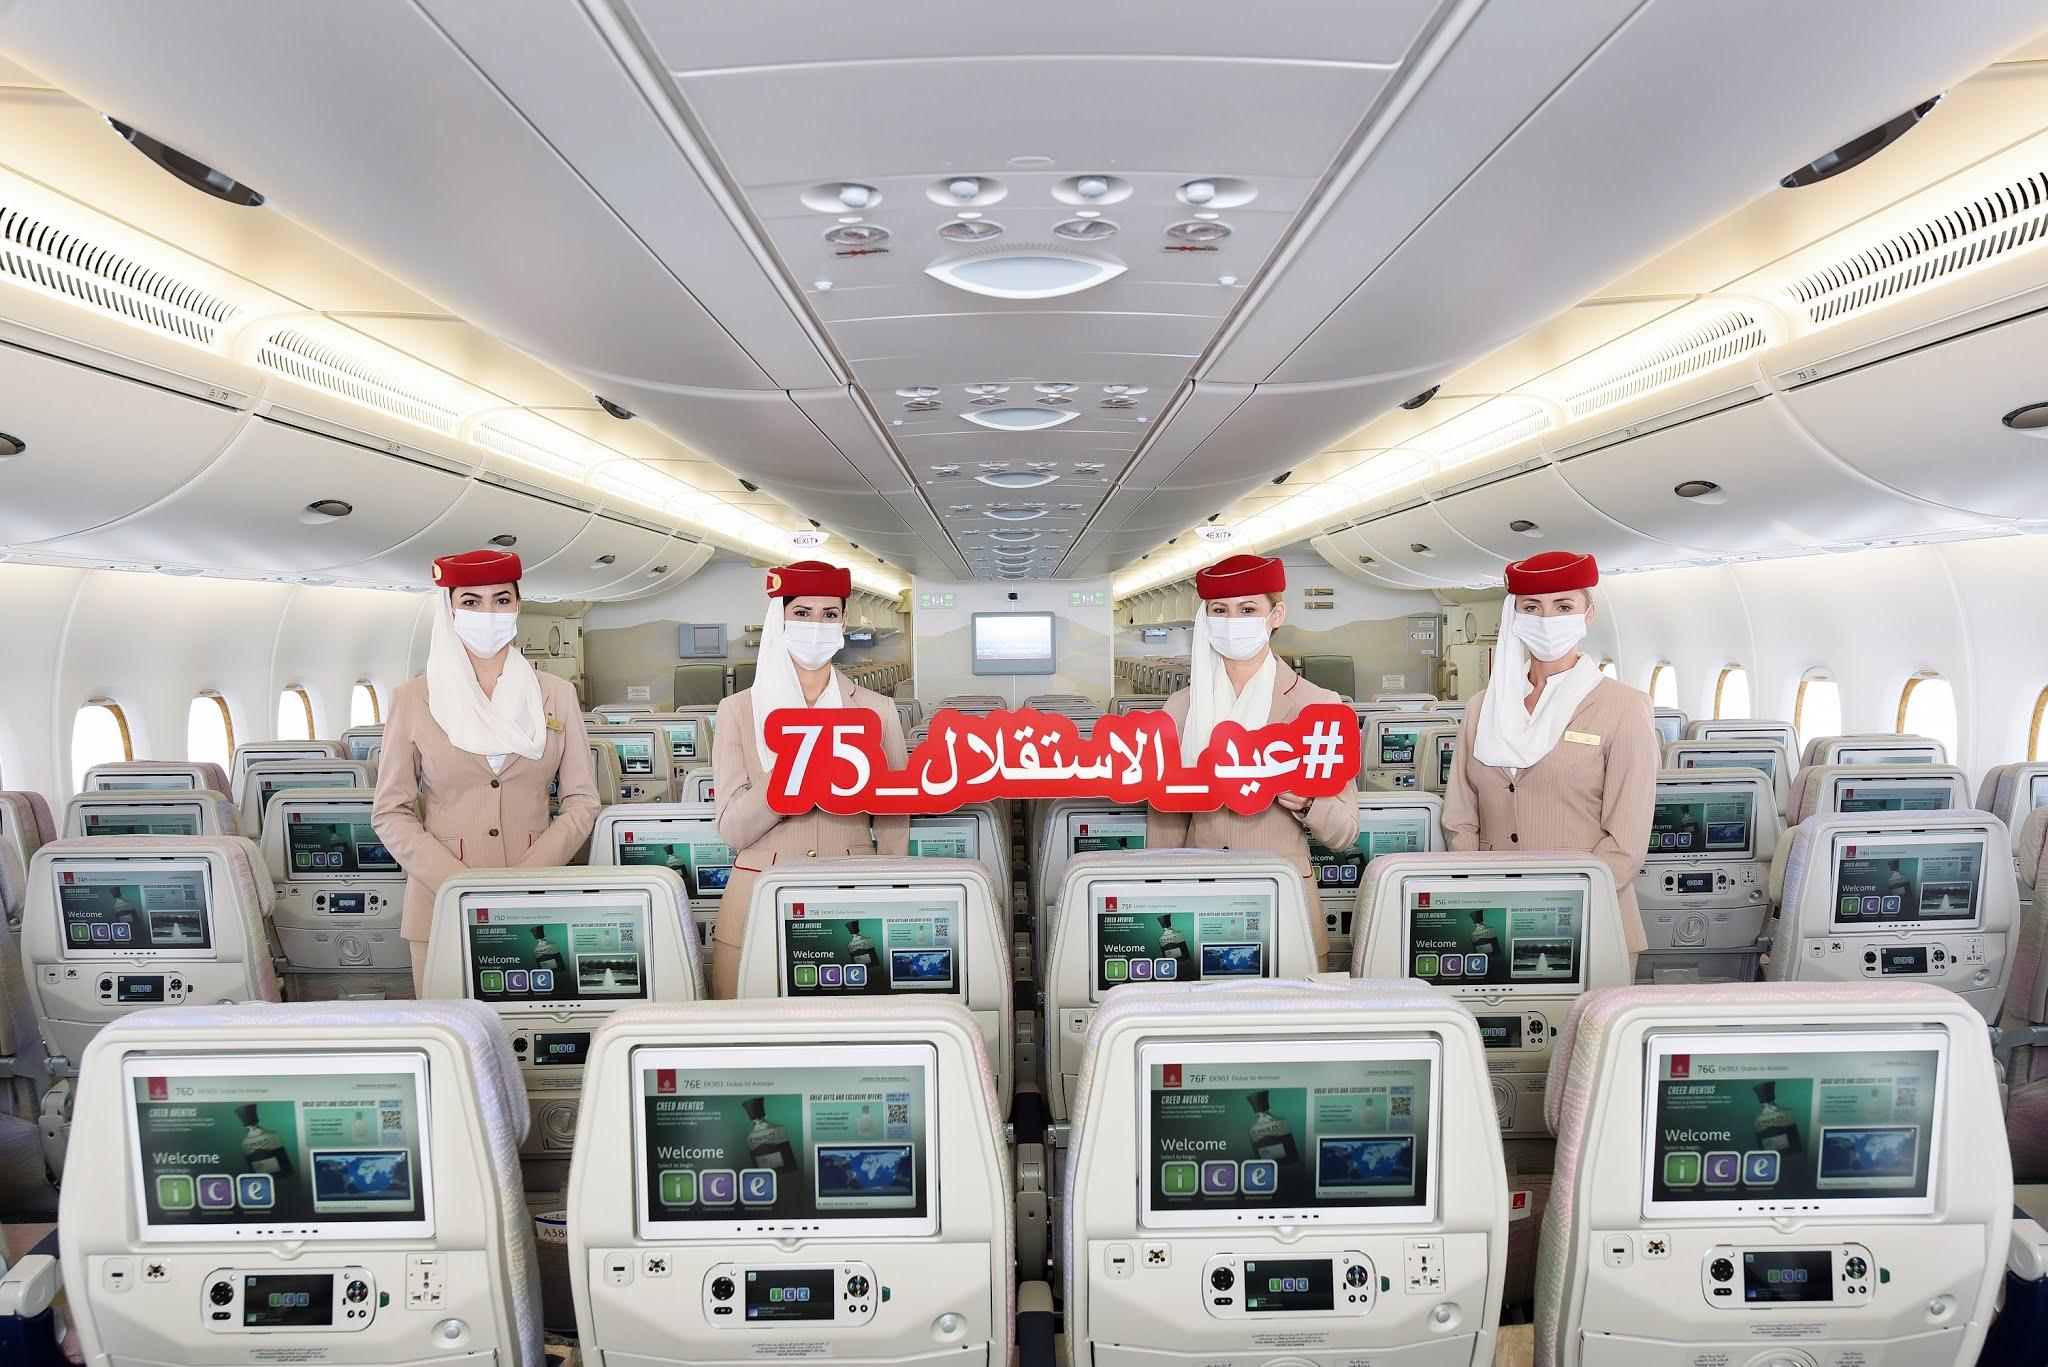 Emirates marks Jordan Independence Day